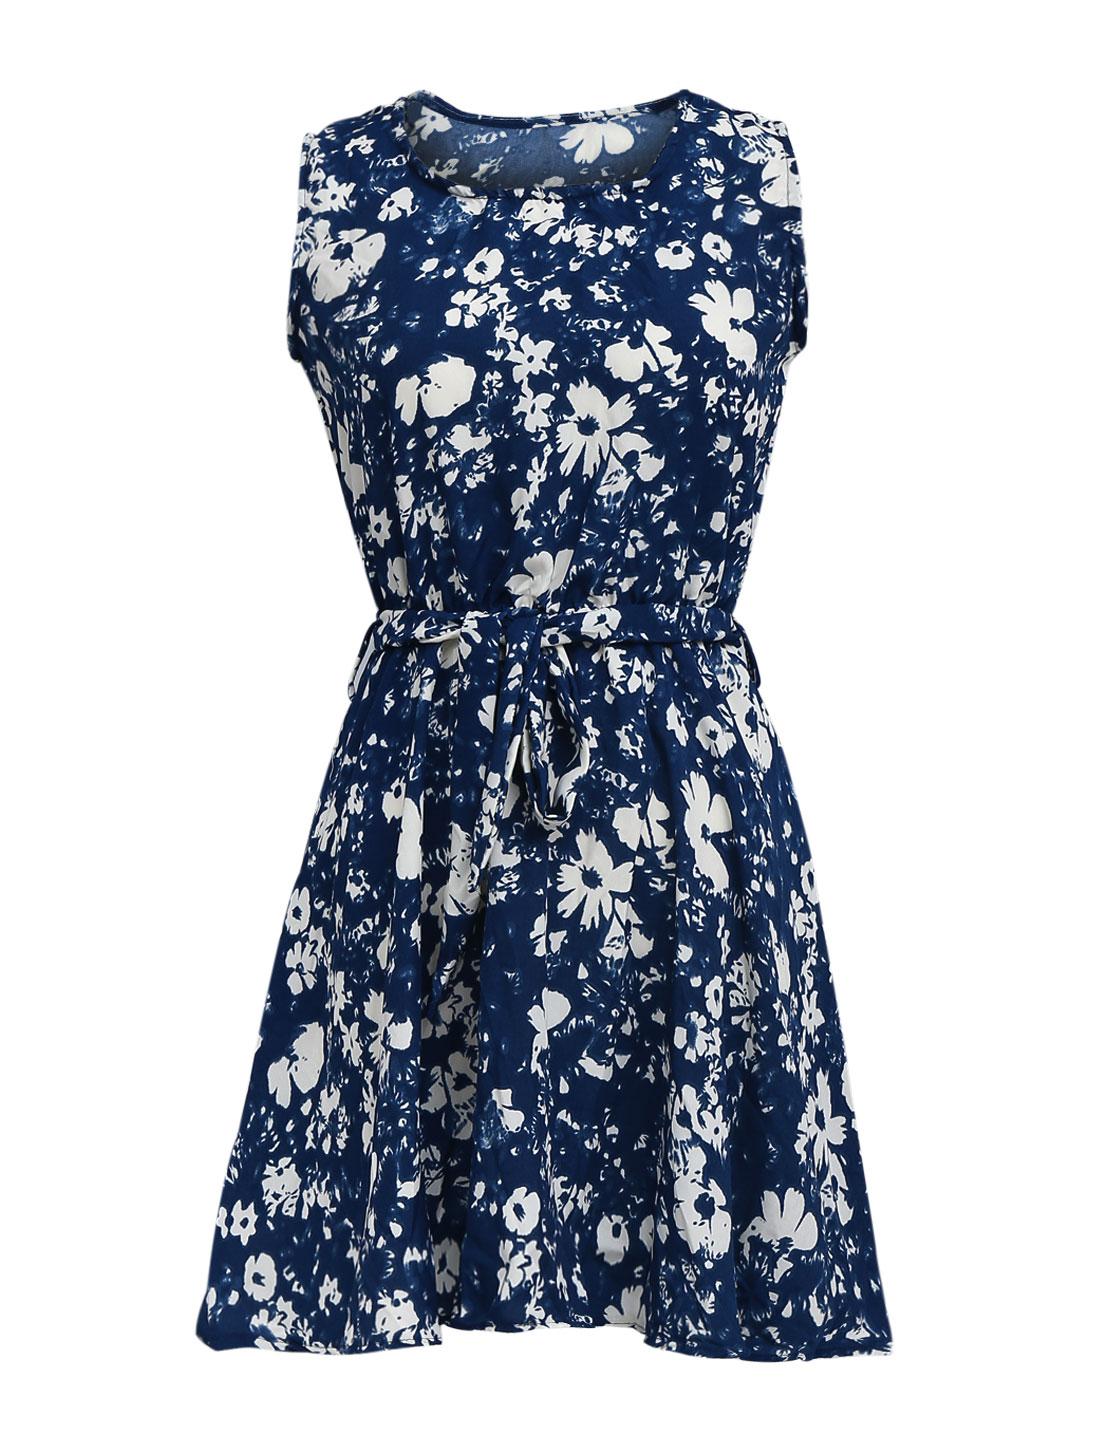 Lady Stretchy Waist Floral Prints Belt Loop Dress Dark Blue XS